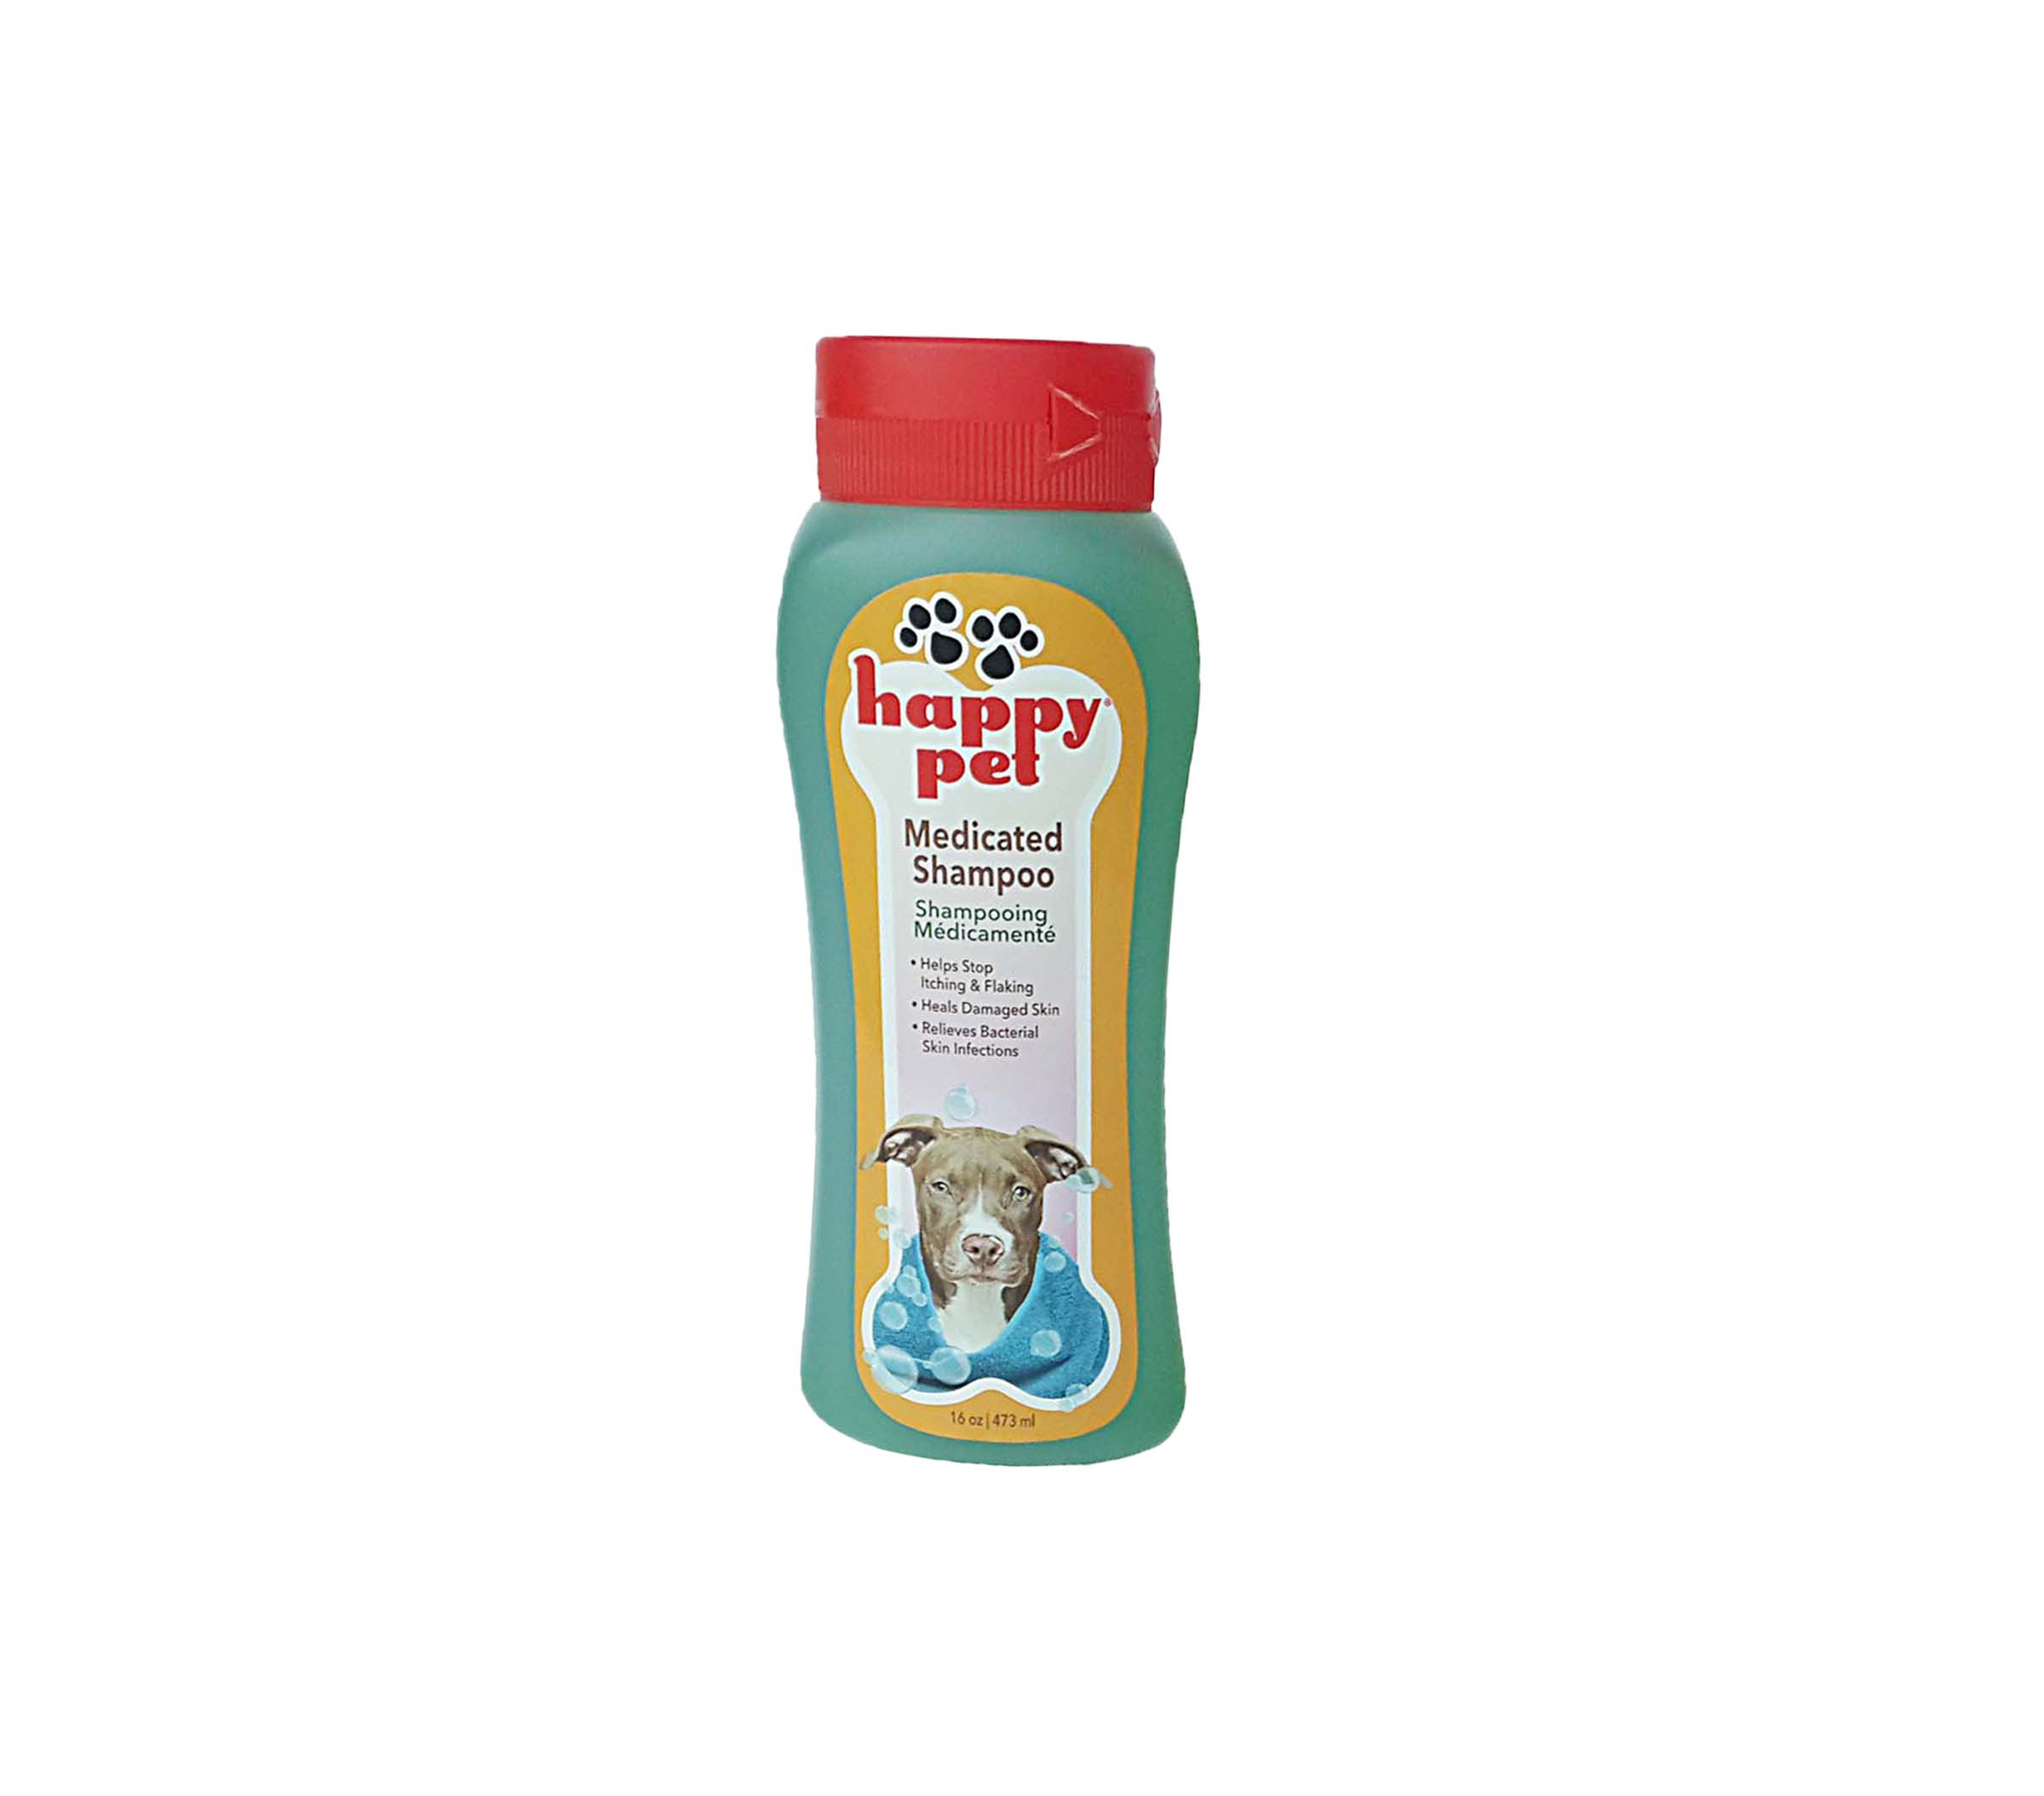 Shampoo Medicado